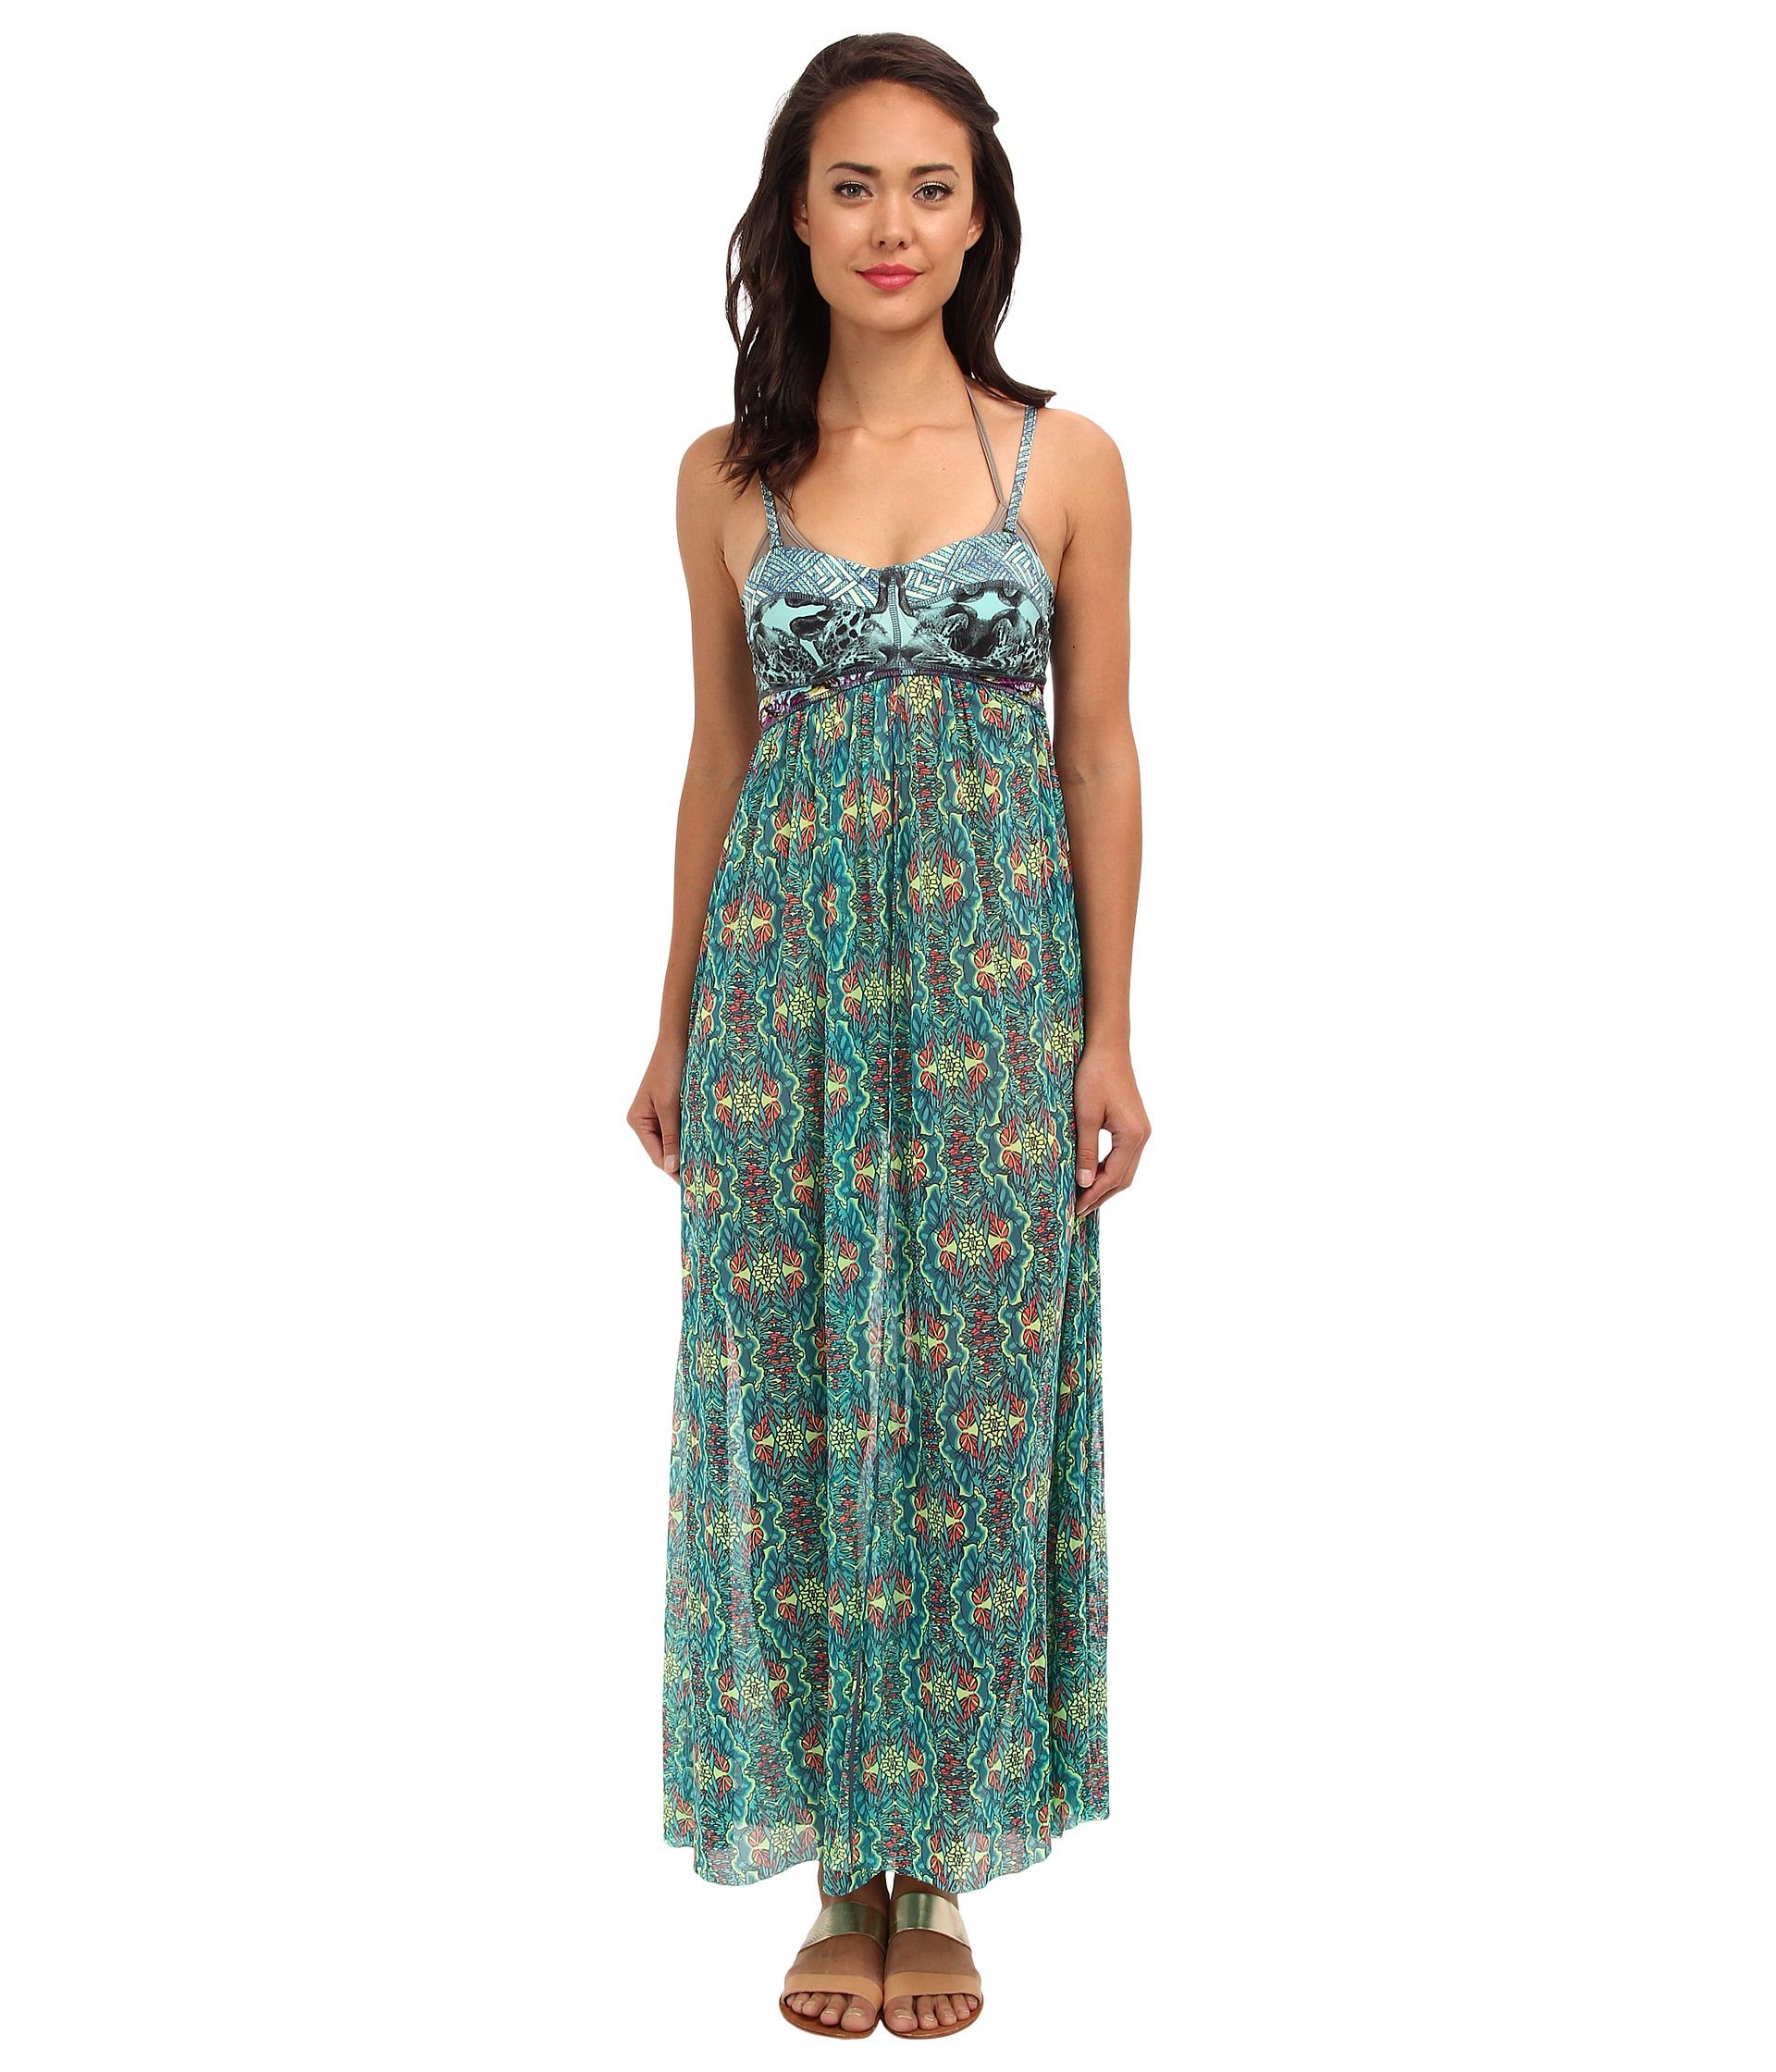 ffbbb6abf7cfb Lyst - Maaji Chimera Goddess Long Dress Cover Up in Green